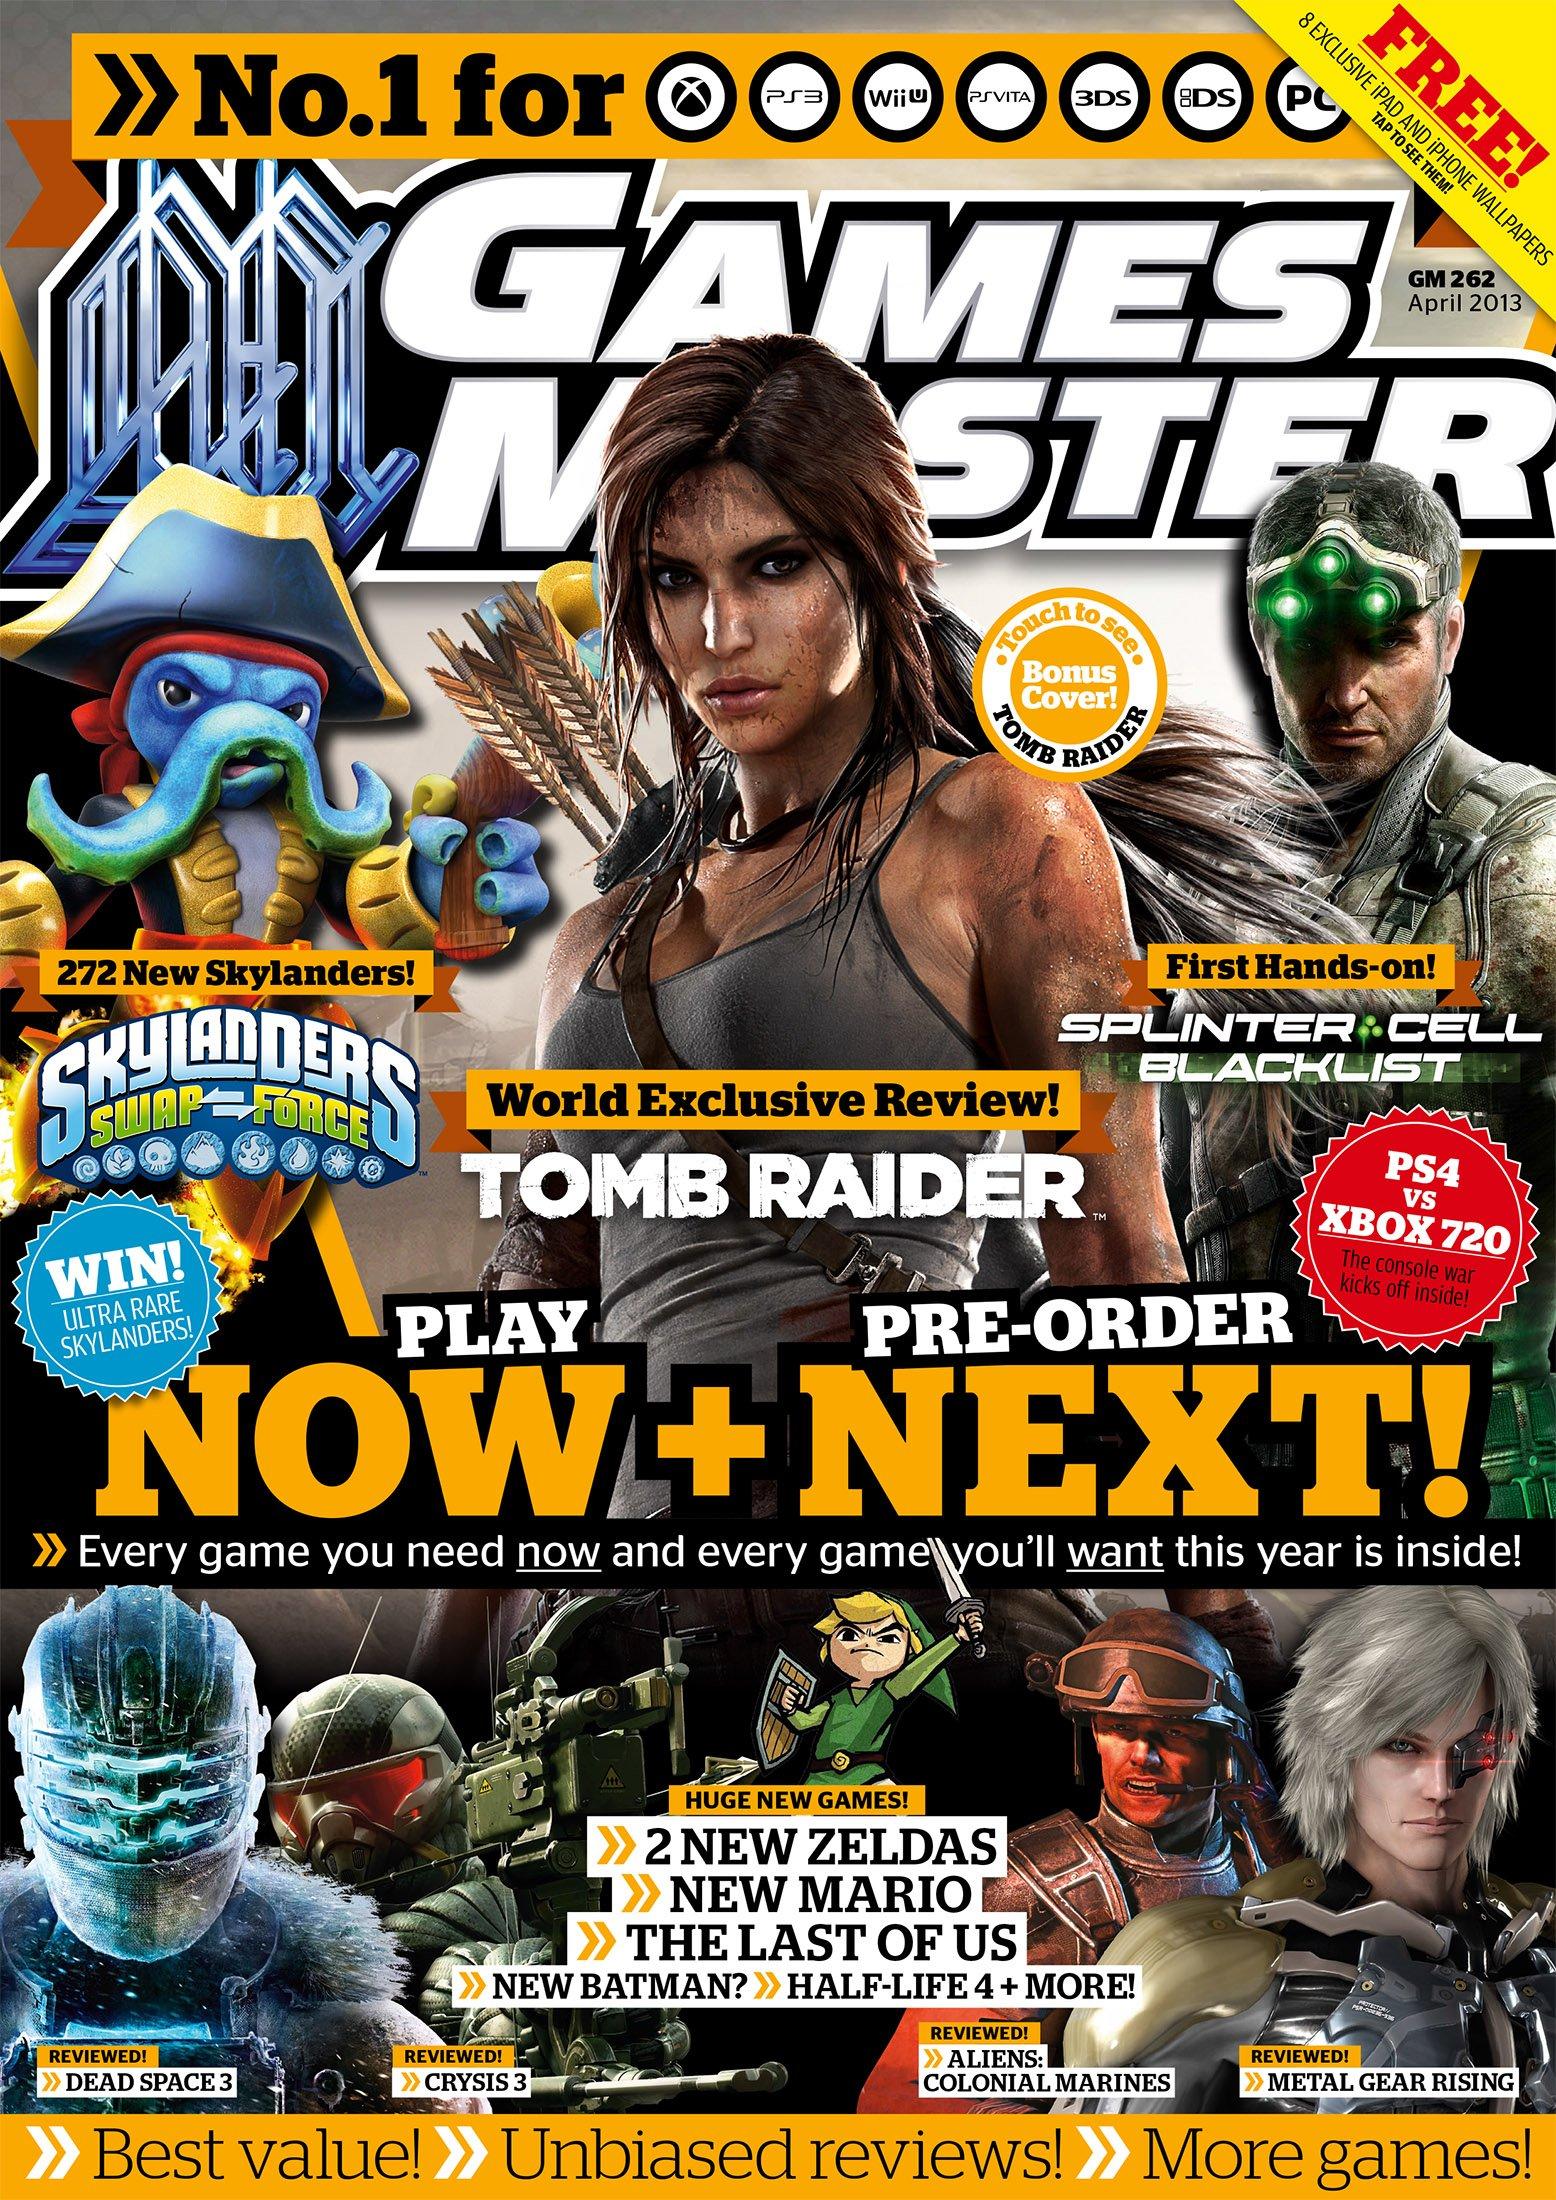 GamesMaster Issue 262 (April 2013) (digital edition)